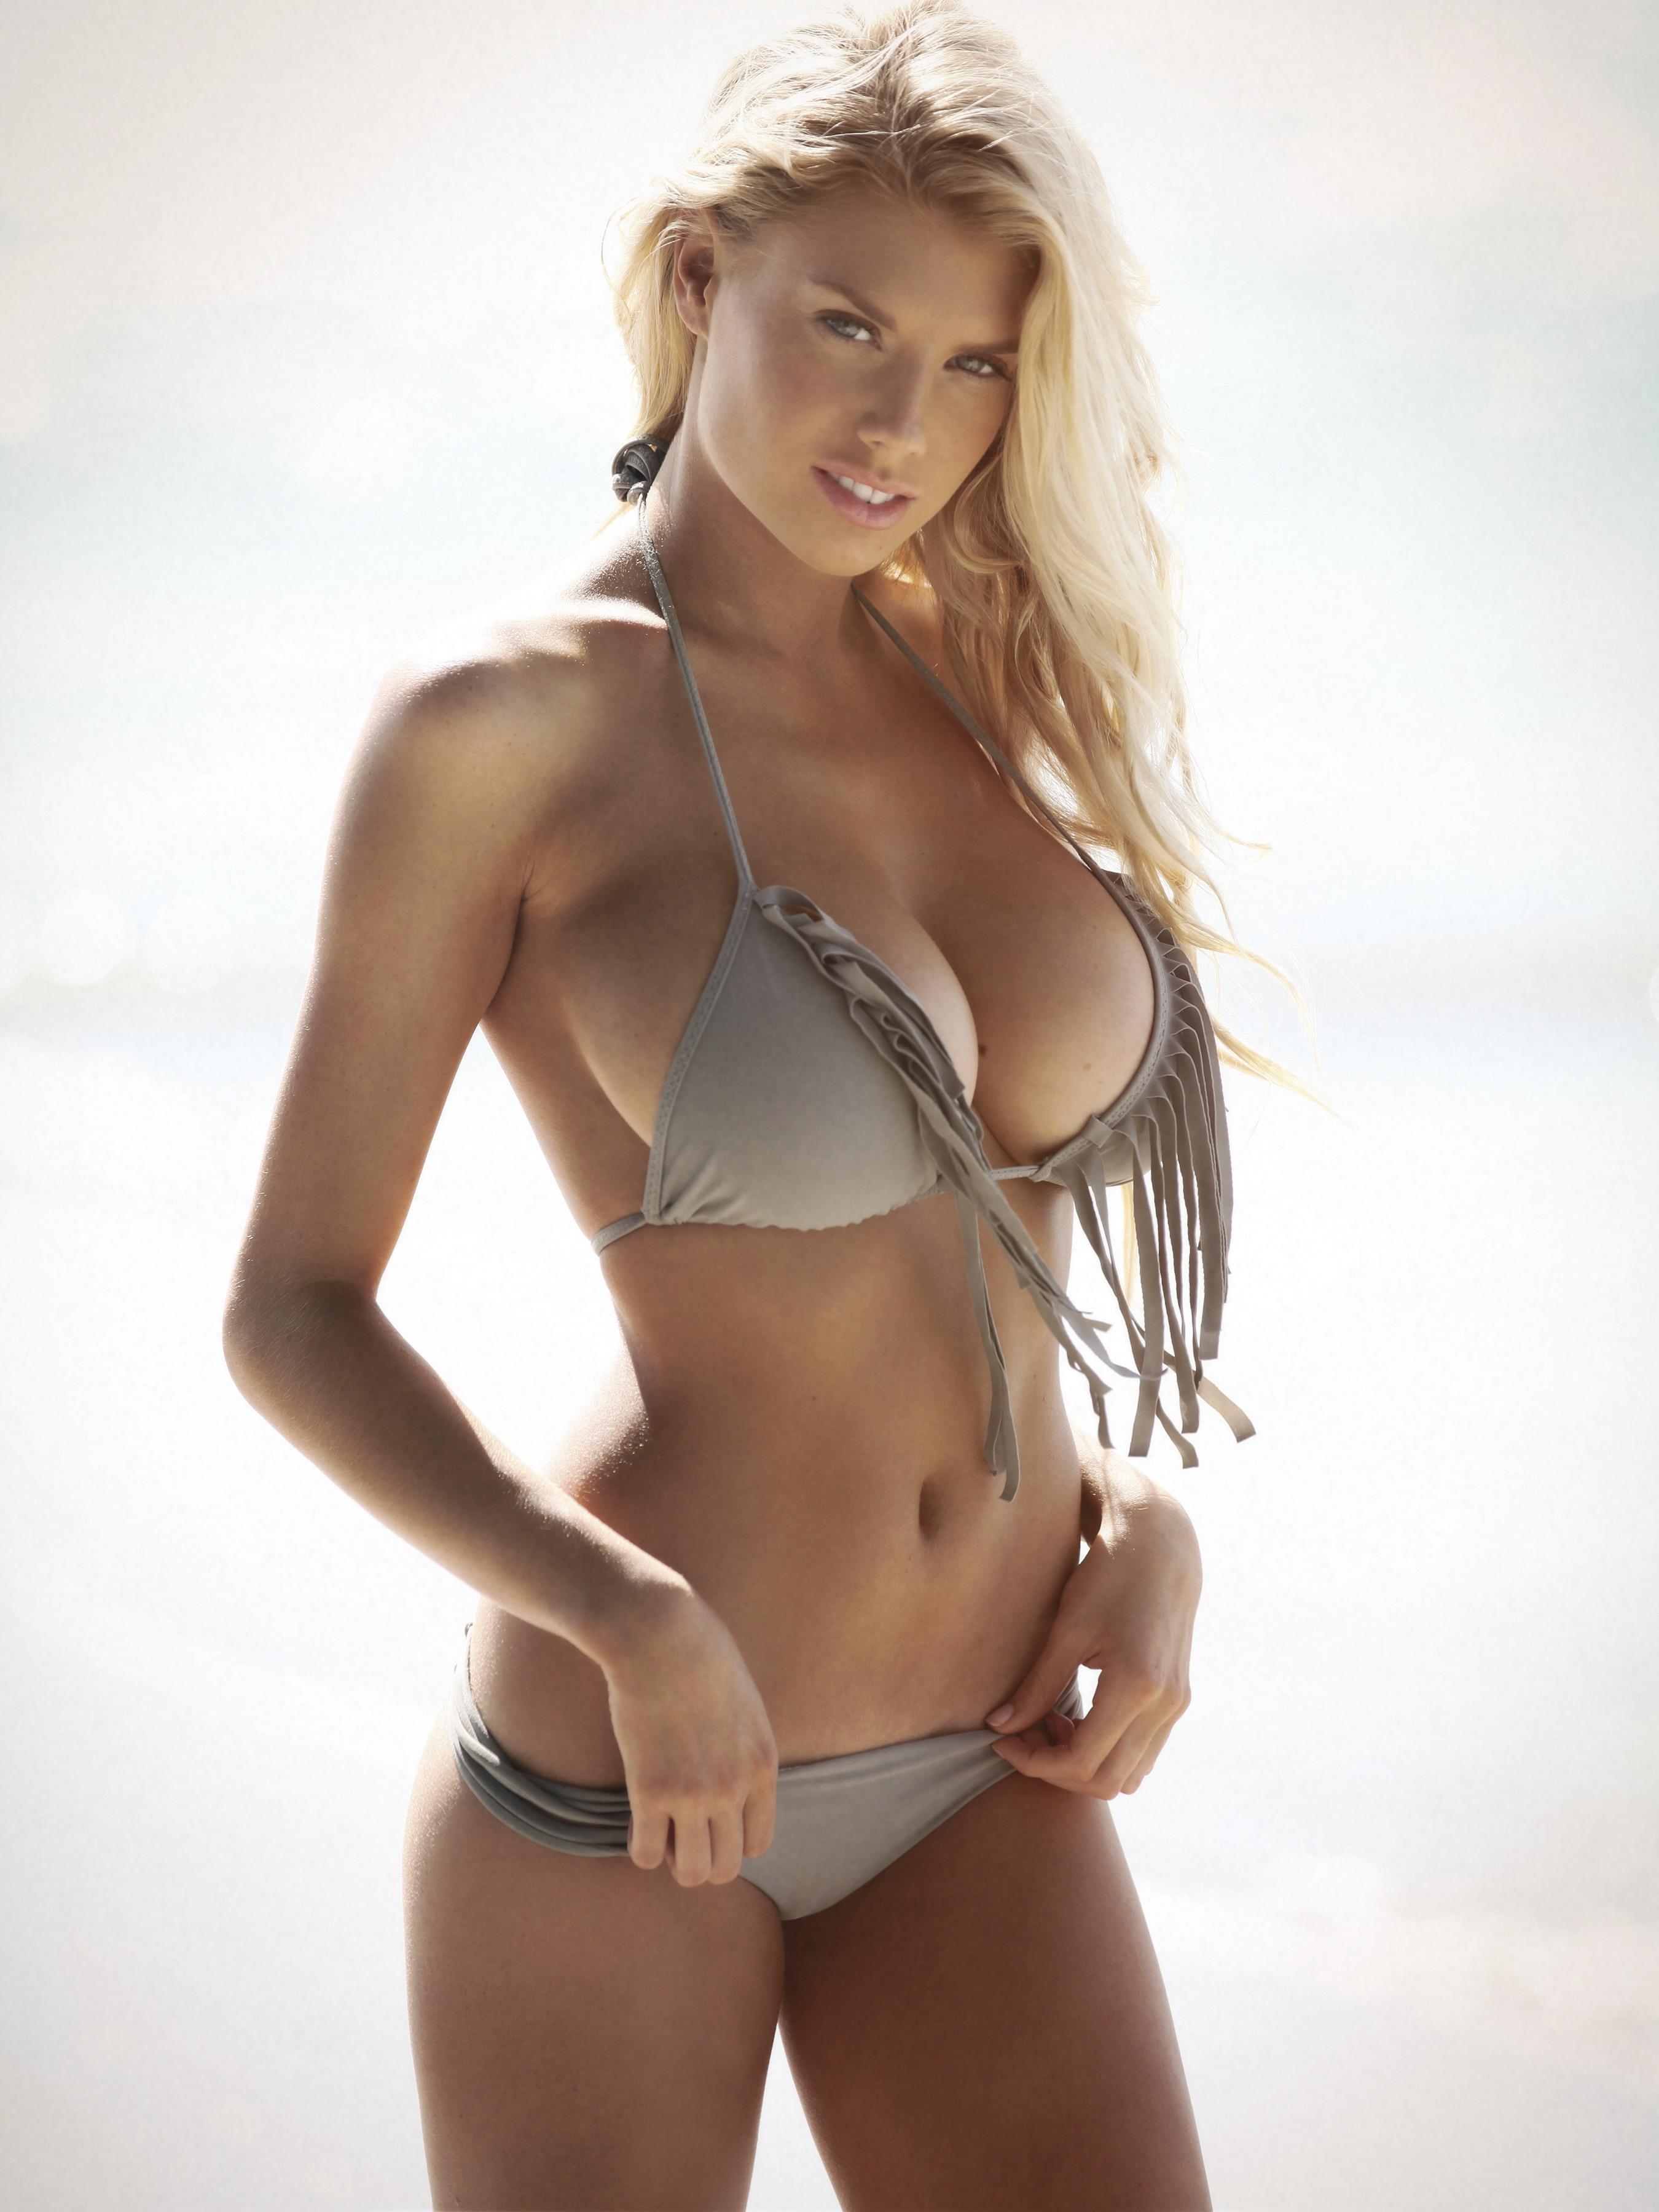 Charlotte mckinney naked photos